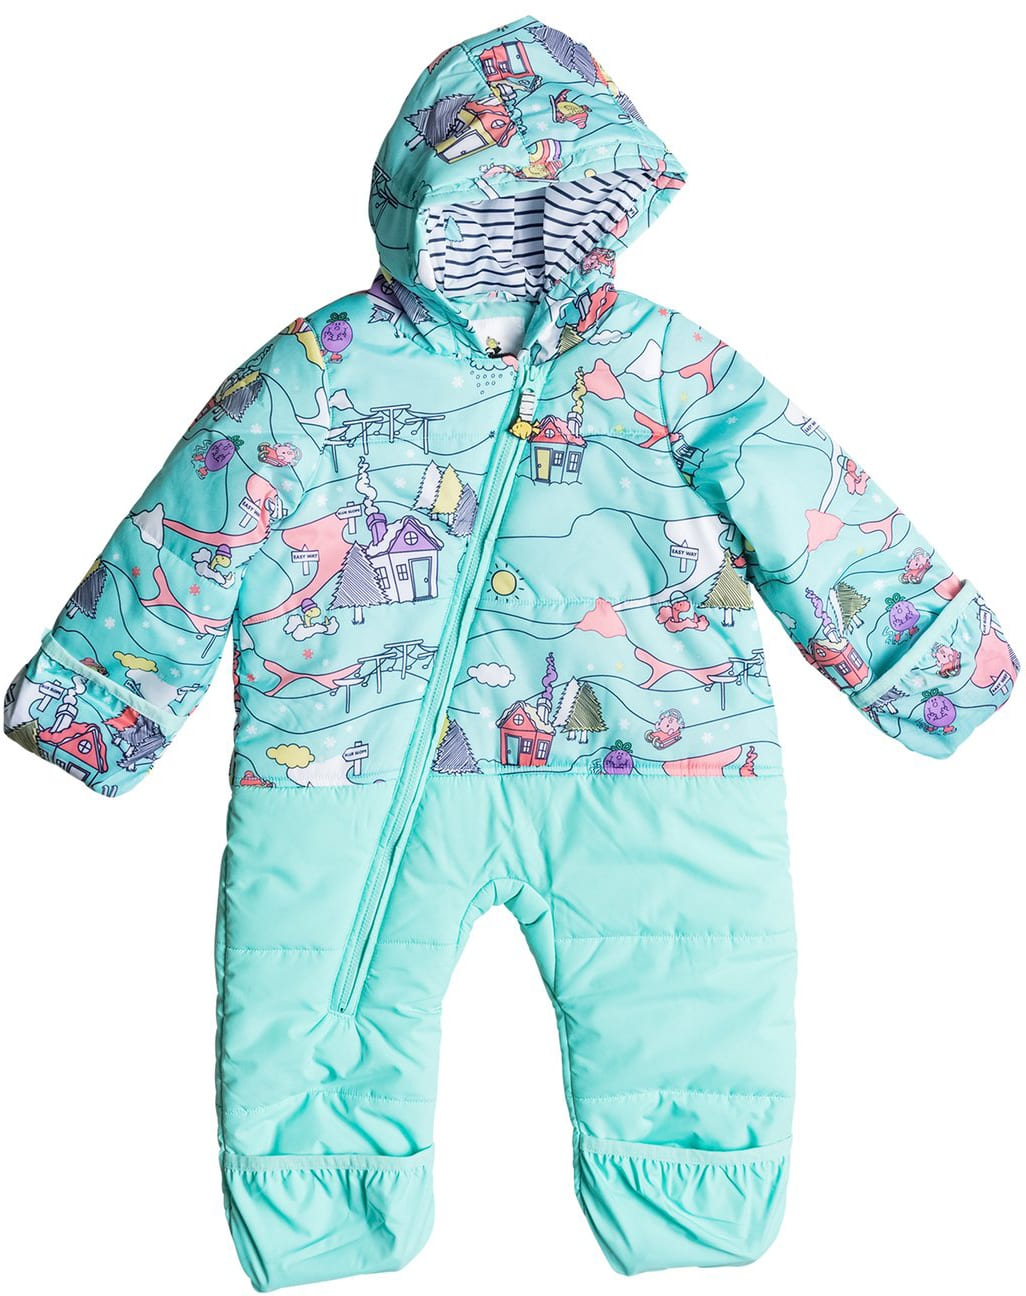 Womens Snow Suit One Piece >> Roxy Rose Little Miss Baby Snowsuit - Girls